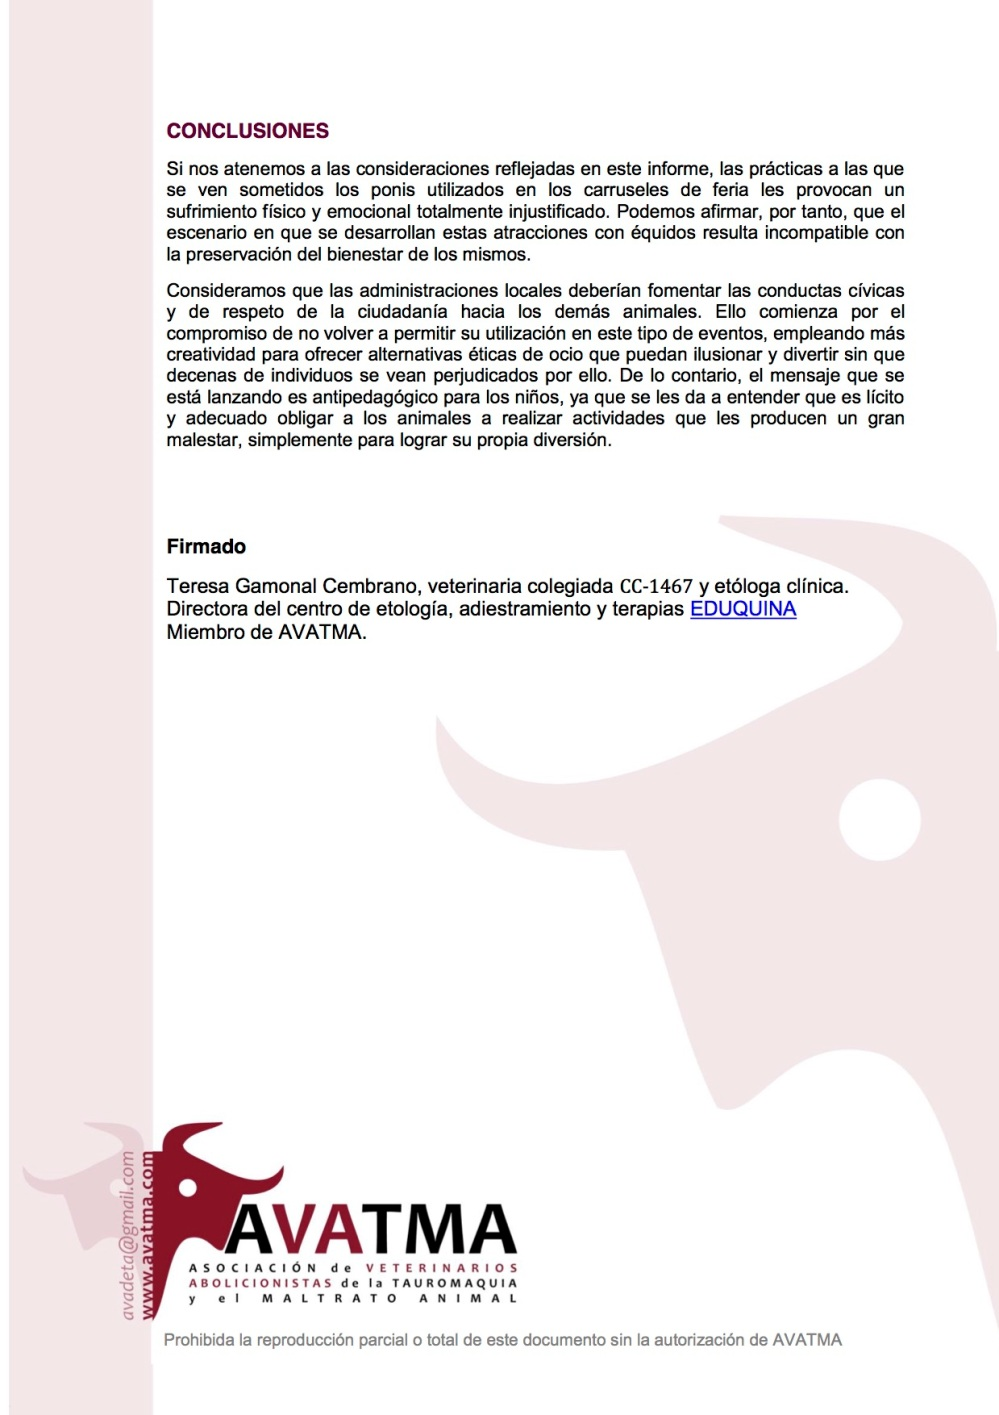 Informe carruseles ponis7